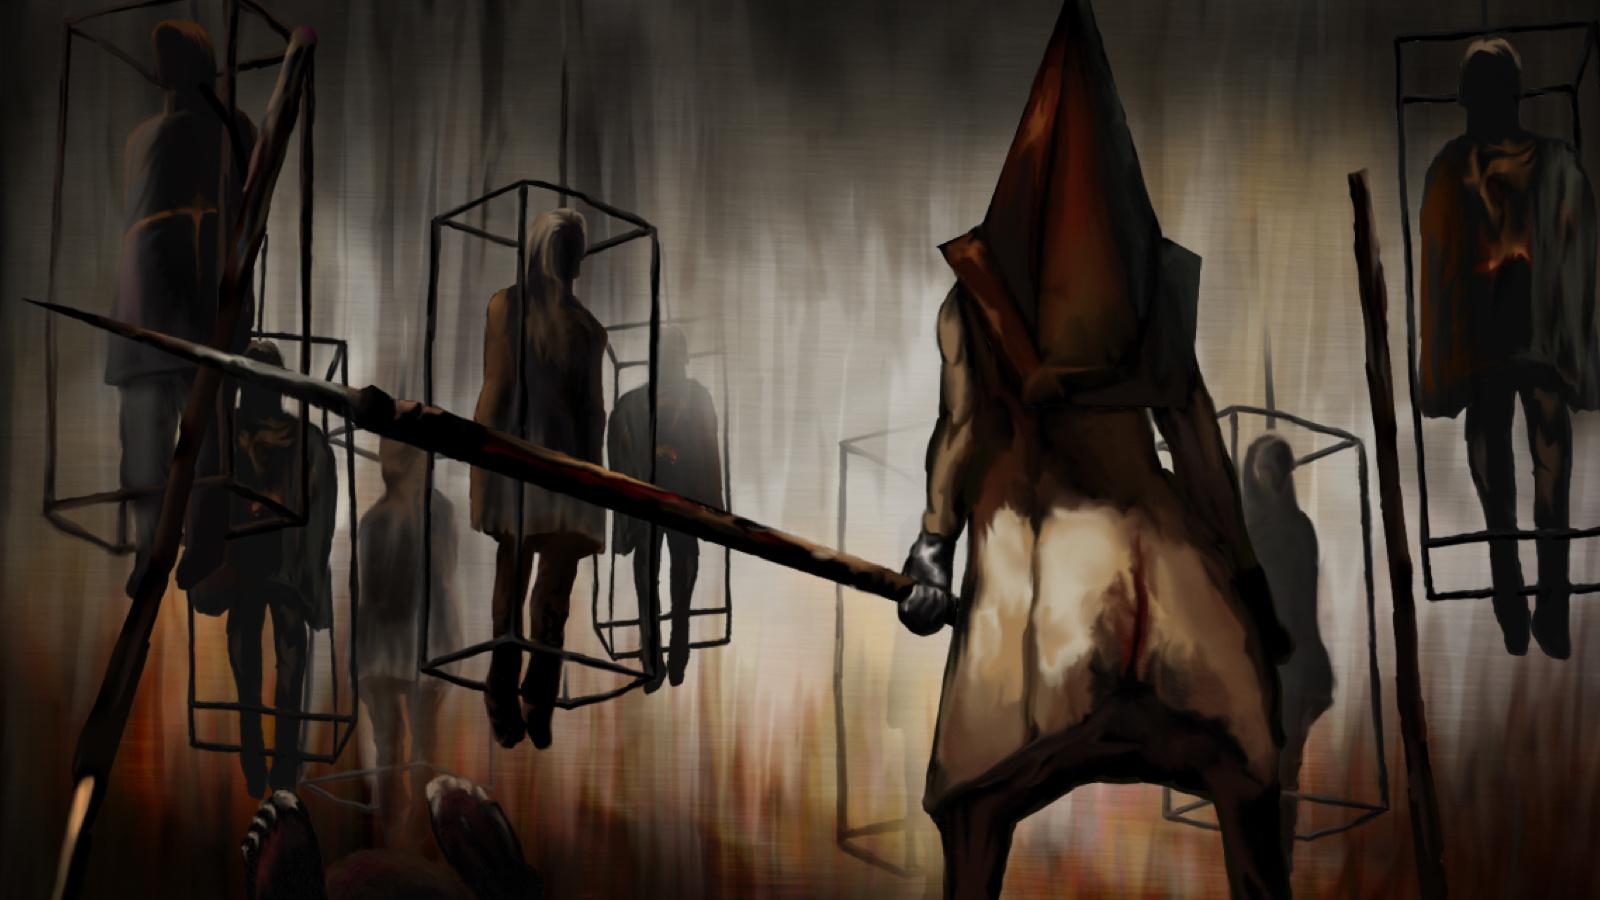 Free Download Silent Hill Pyramid Head Hd Wallpaper General 908846